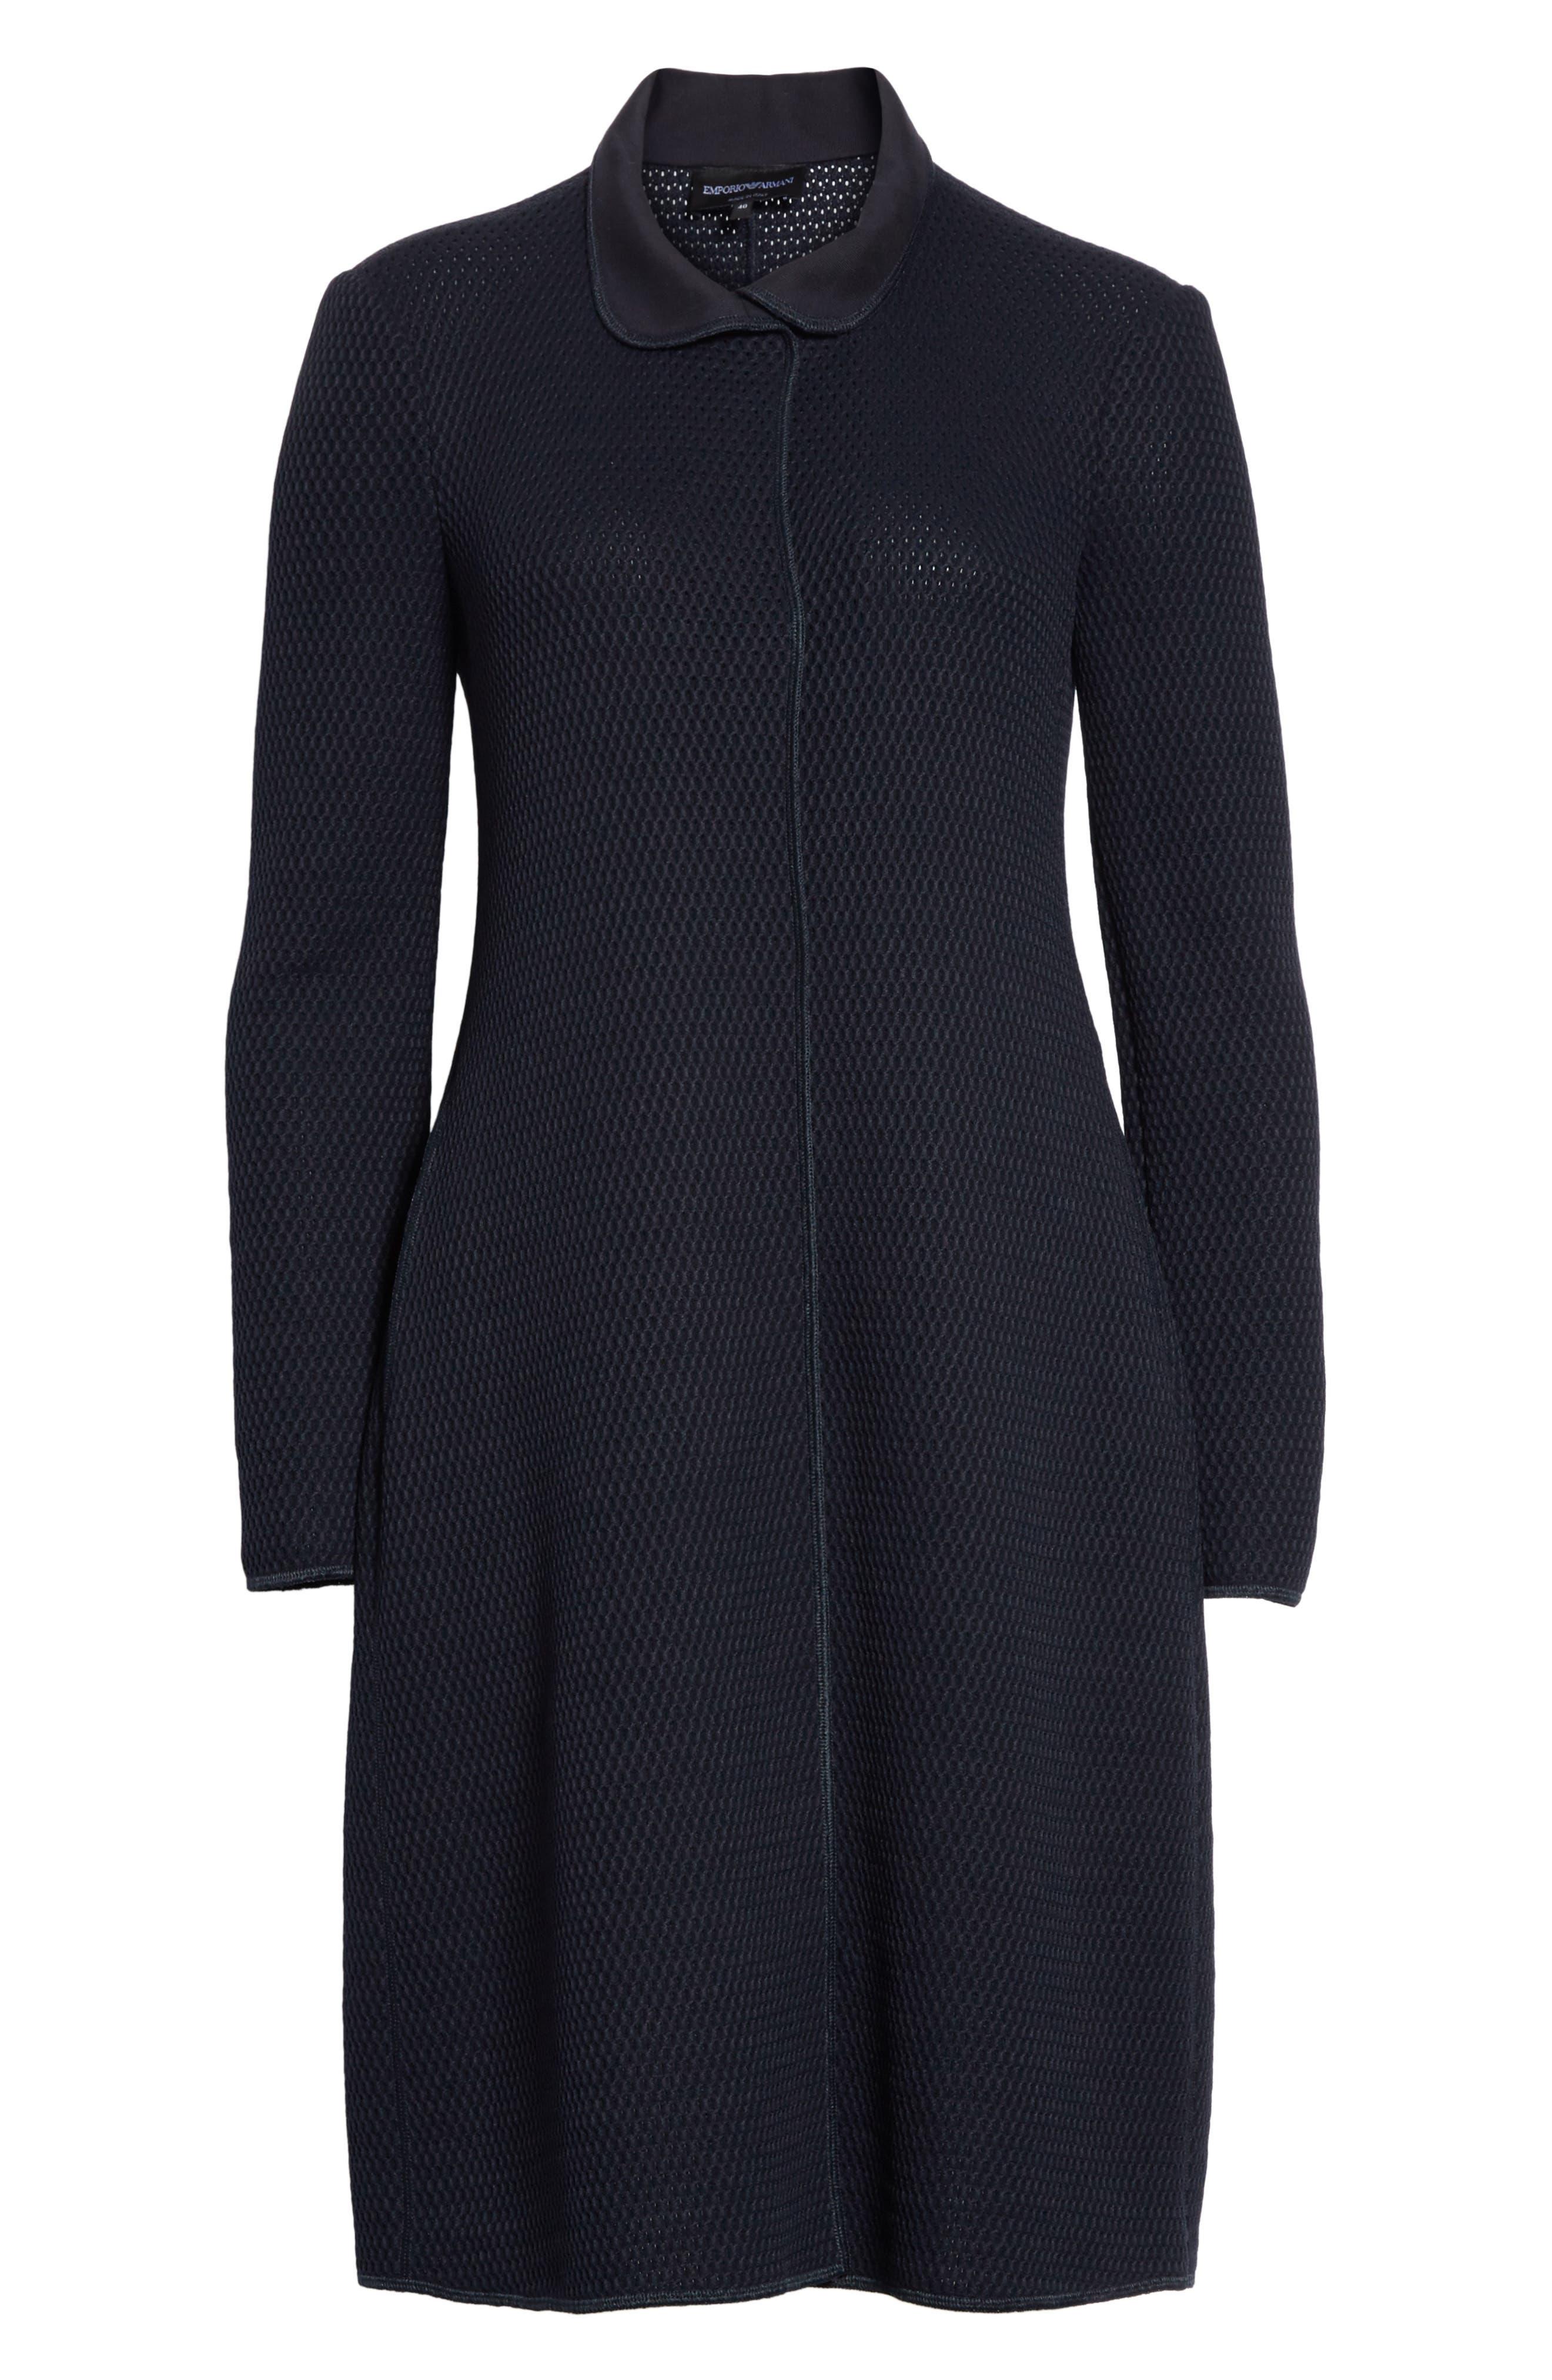 Honeycomb Knit Jersey Coat,                             Alternate thumbnail 6, color,                             Navy